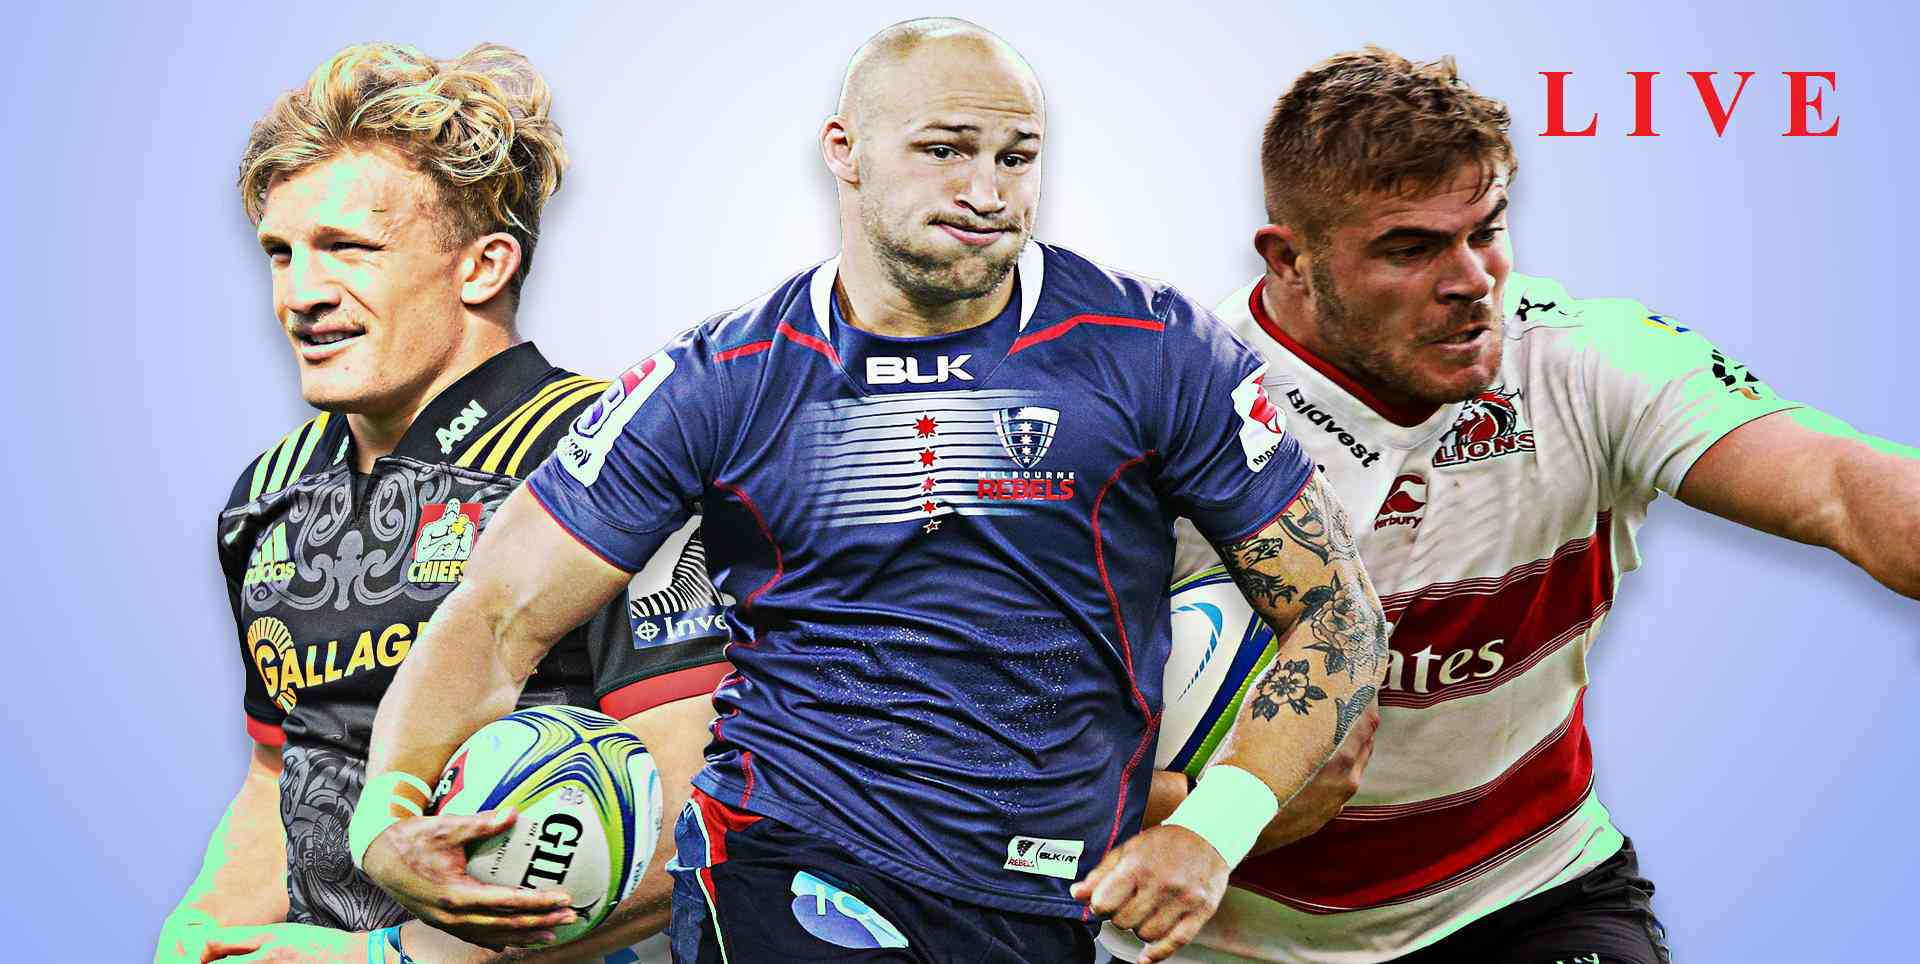 2018-waratahs-vs-sharks-rugby-live-stream